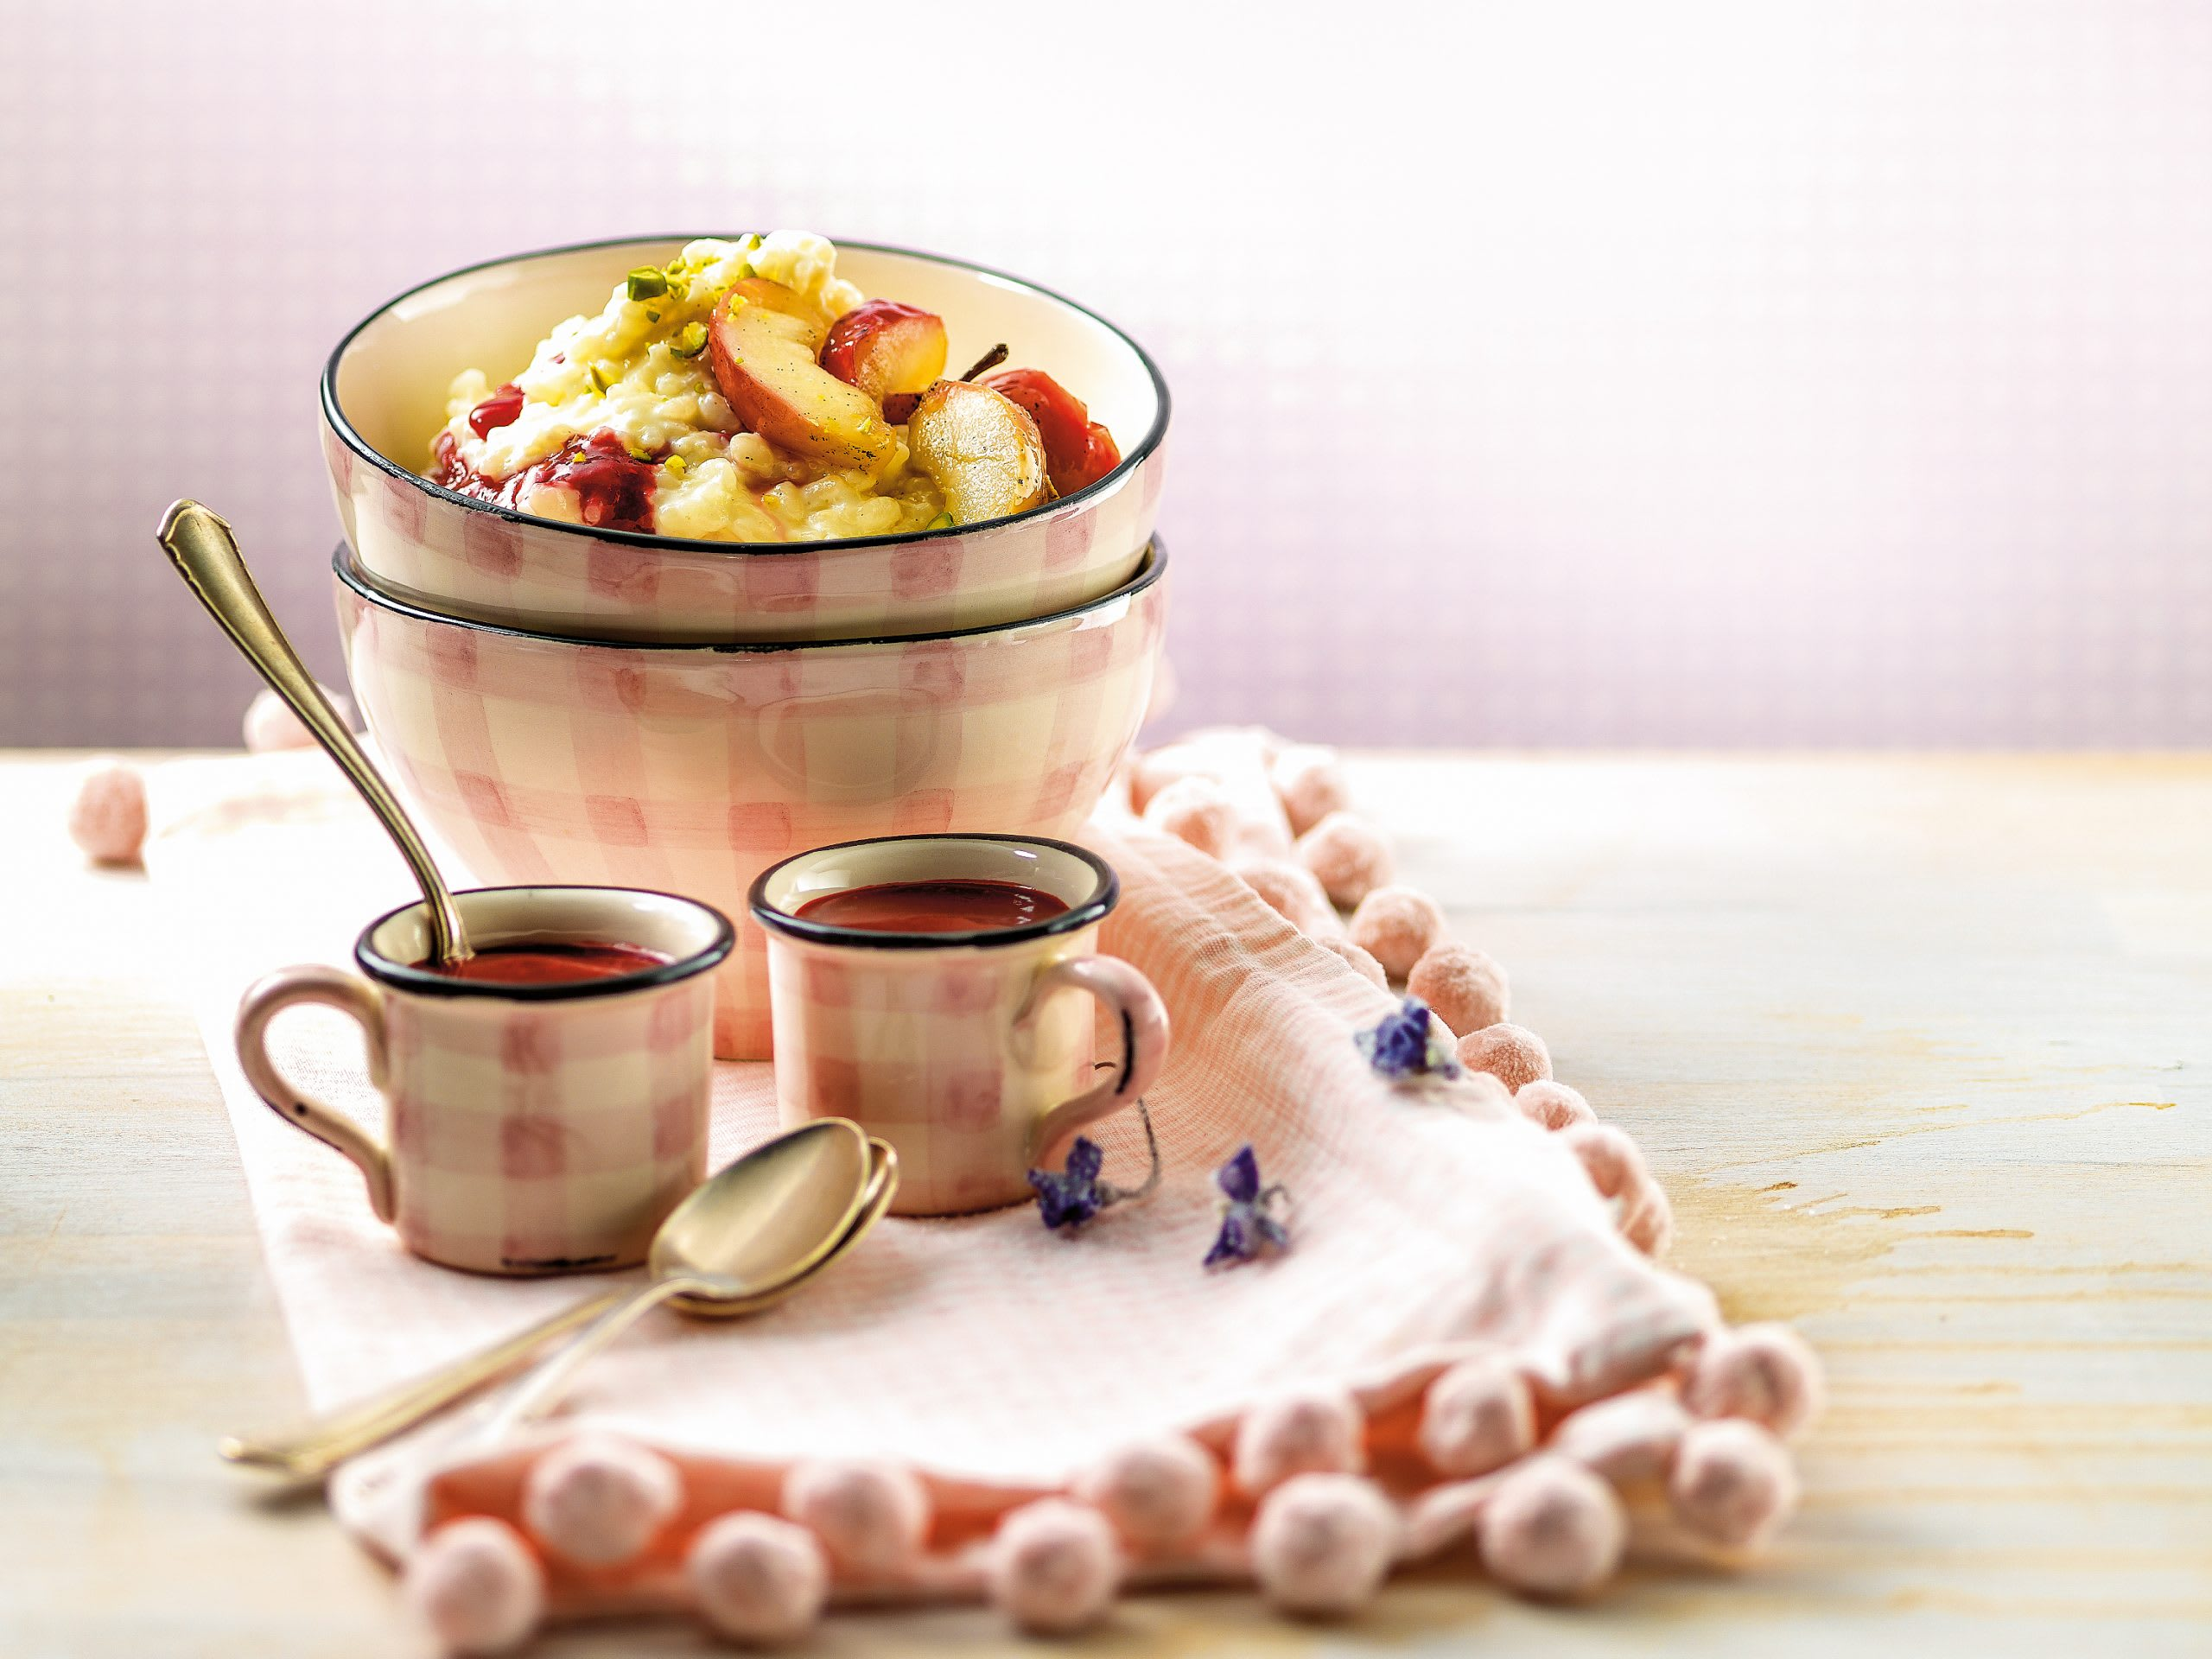 Himbeer-Milchreis mit Vanille-Äpfeln